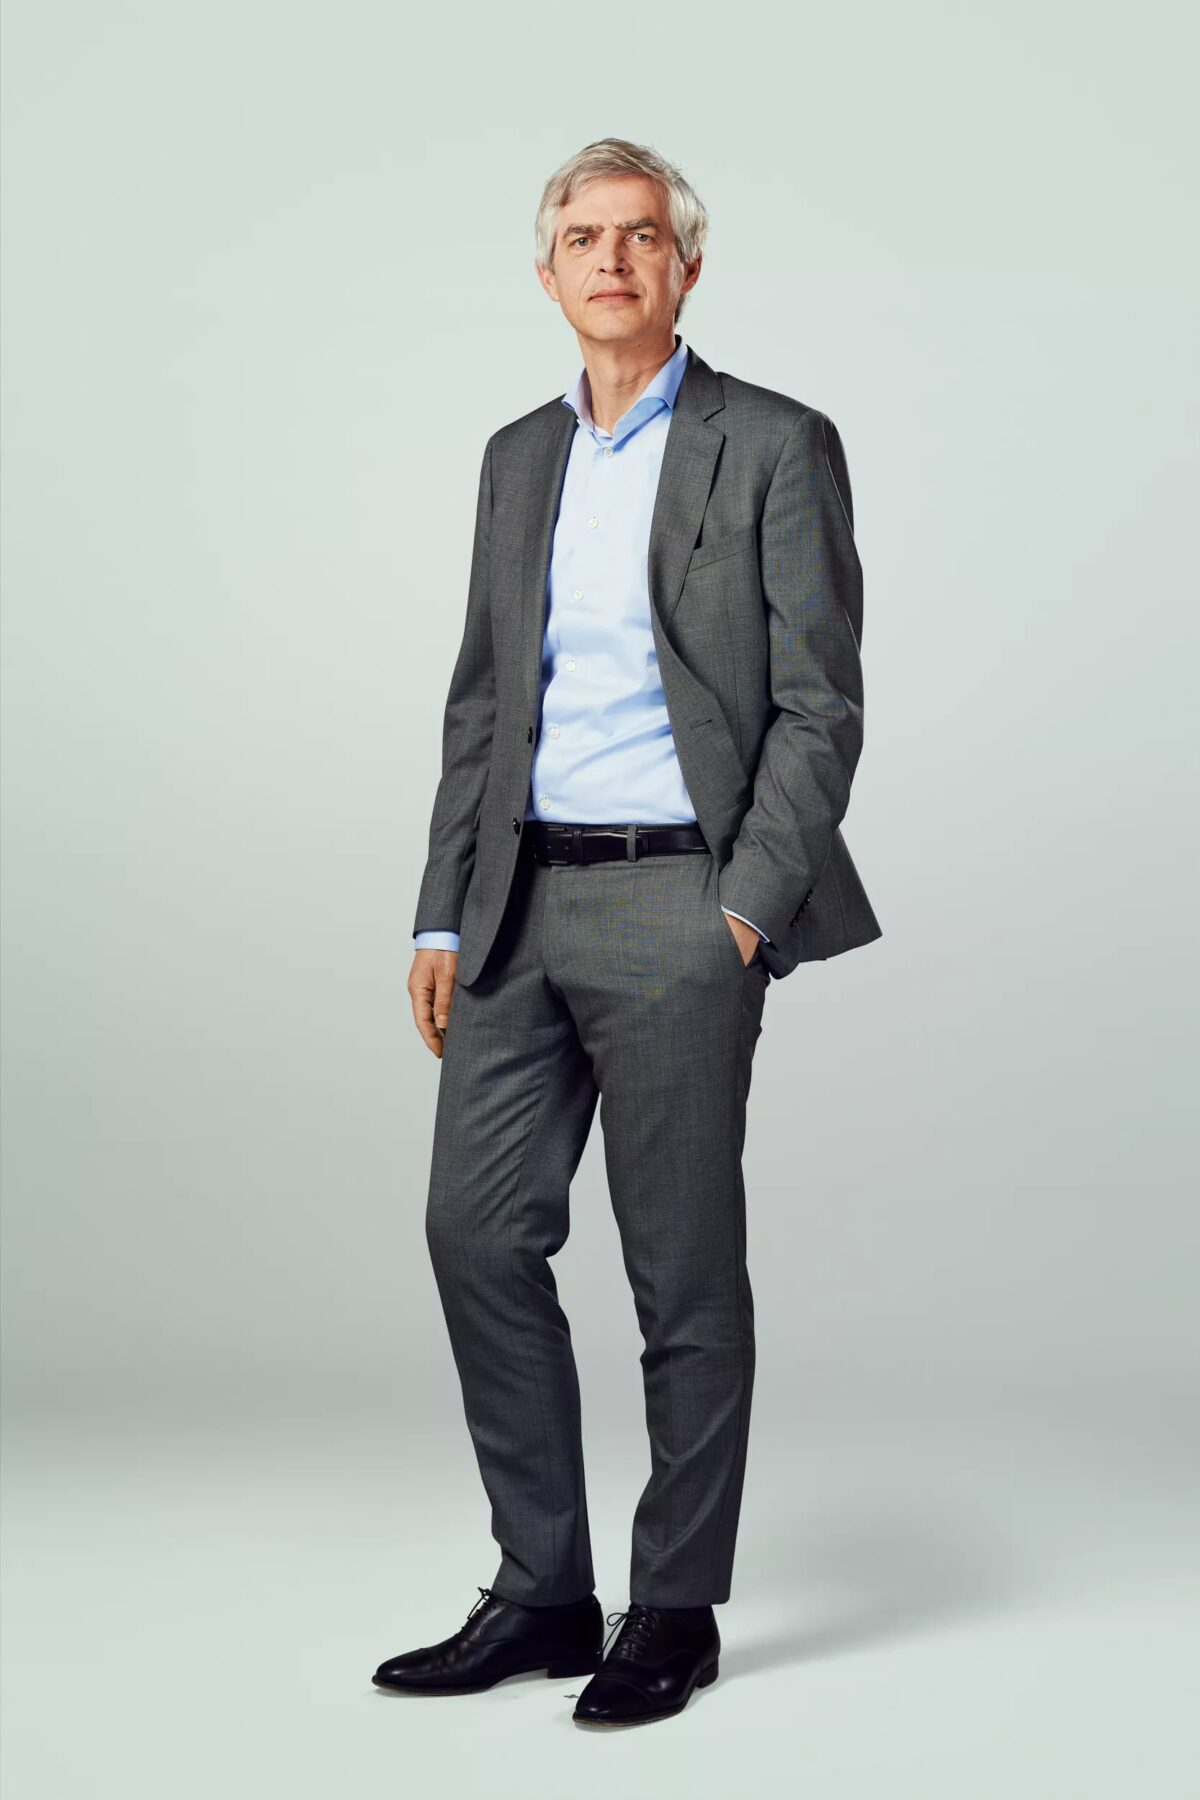 mr. K.A. (Kanter) Breuker